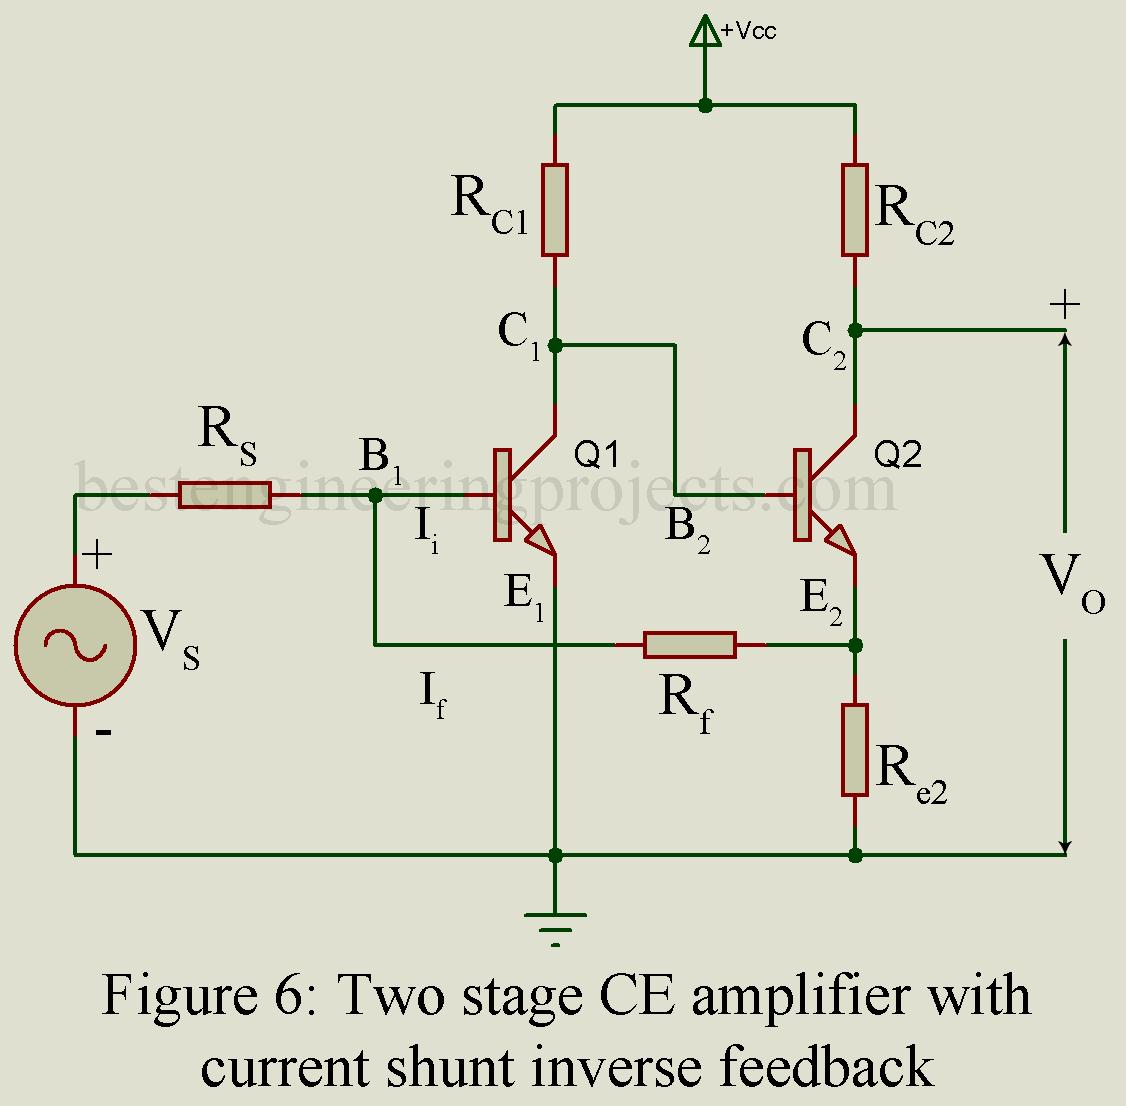 hight resolution of current amplifier circuit automotivecircuit circuit diagram schema current amplifier circuit automotivecircuit circuit diagram wiring current amplifier